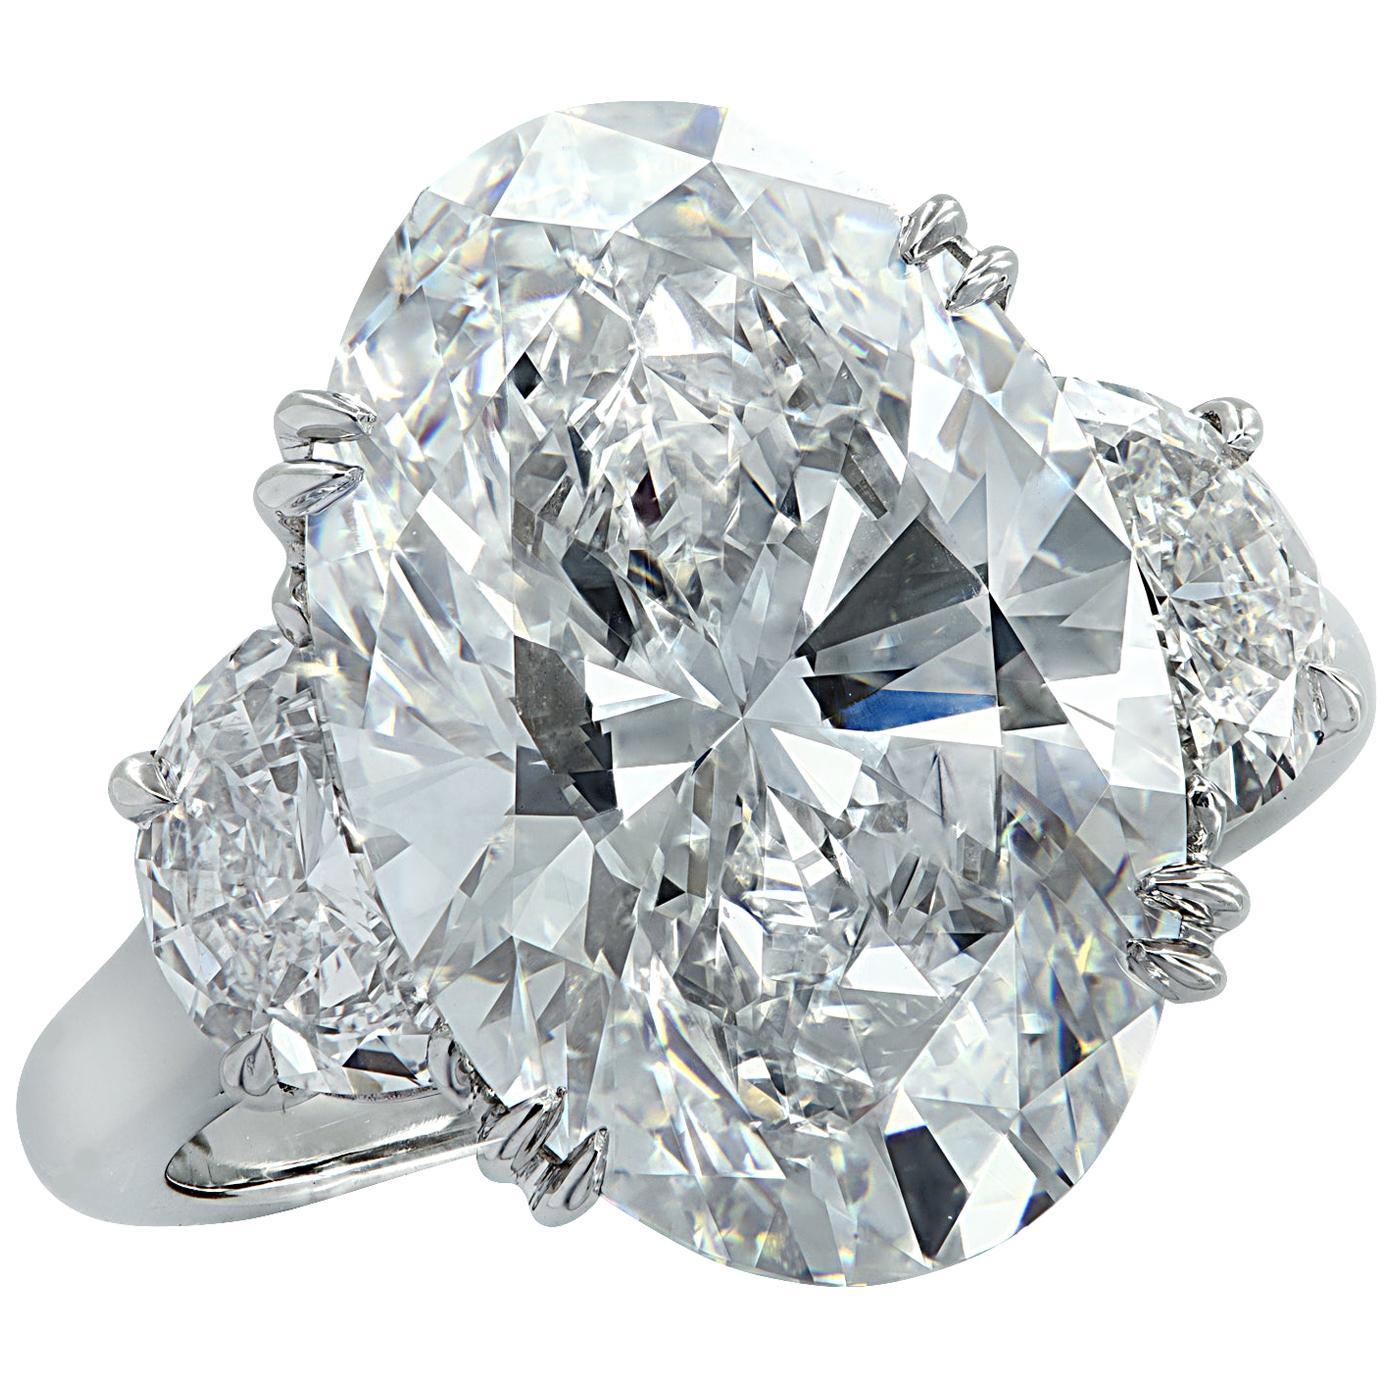 Vivid Diamonds GIA Certified 8.87 Carat Oval Diamond Engagement Ring